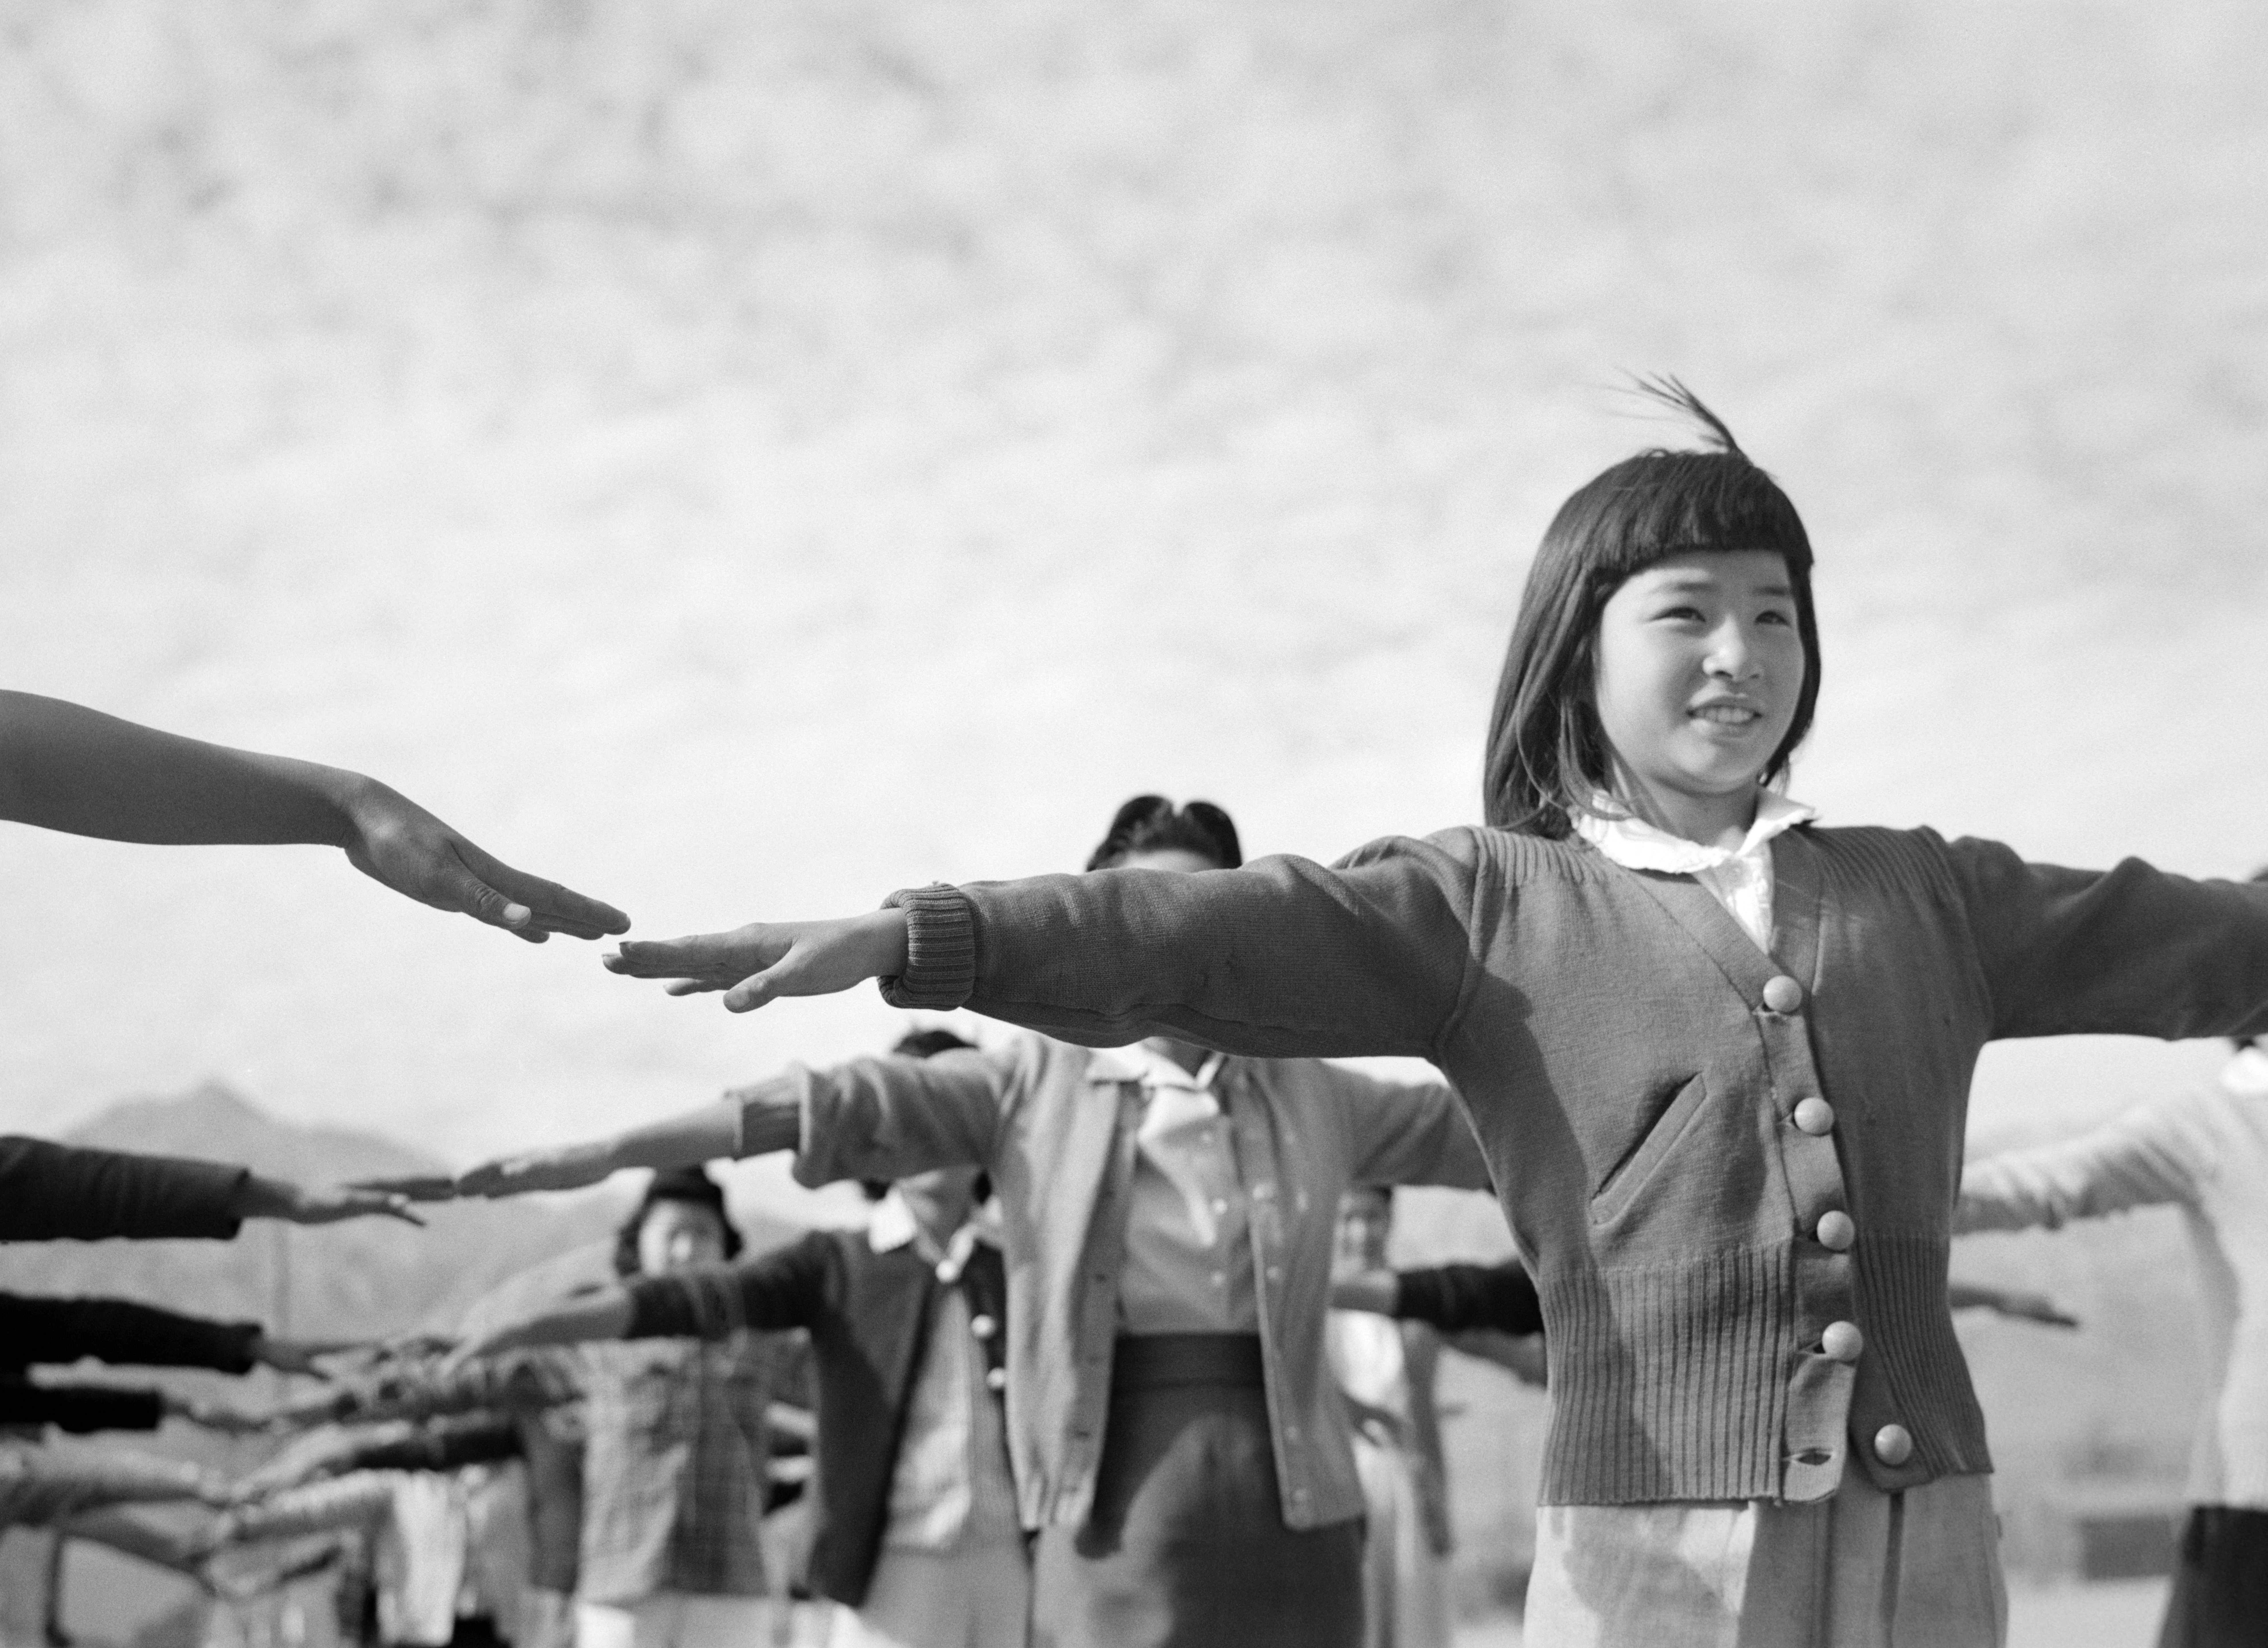 farewell to manzanar an essay on the book farewell to manzanar  camp life at manzanar female internees practicing calisthenics